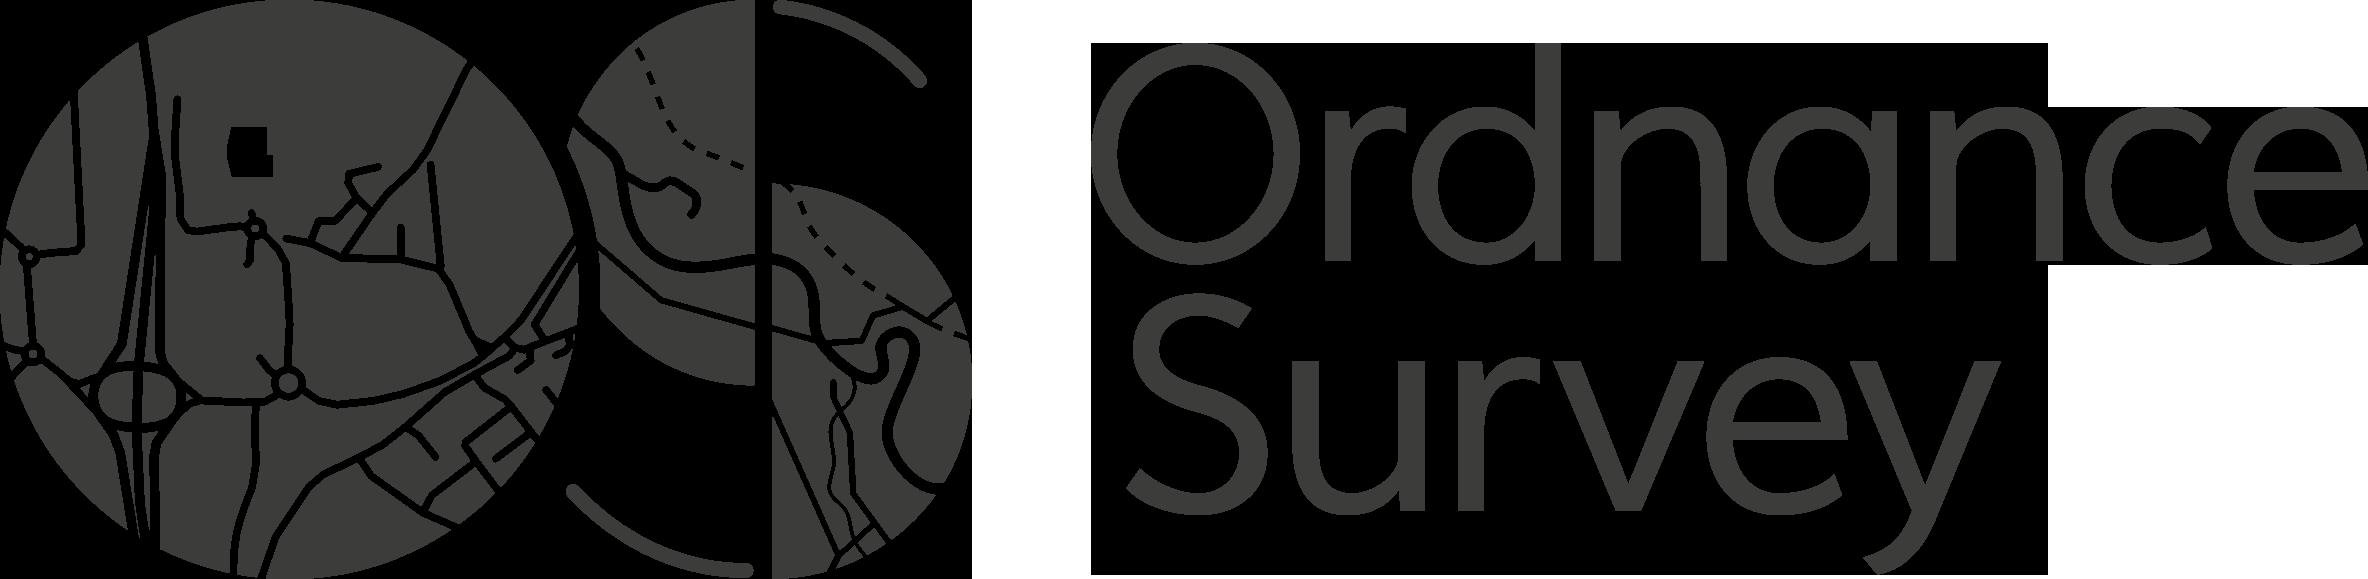 Ordnance Survey home